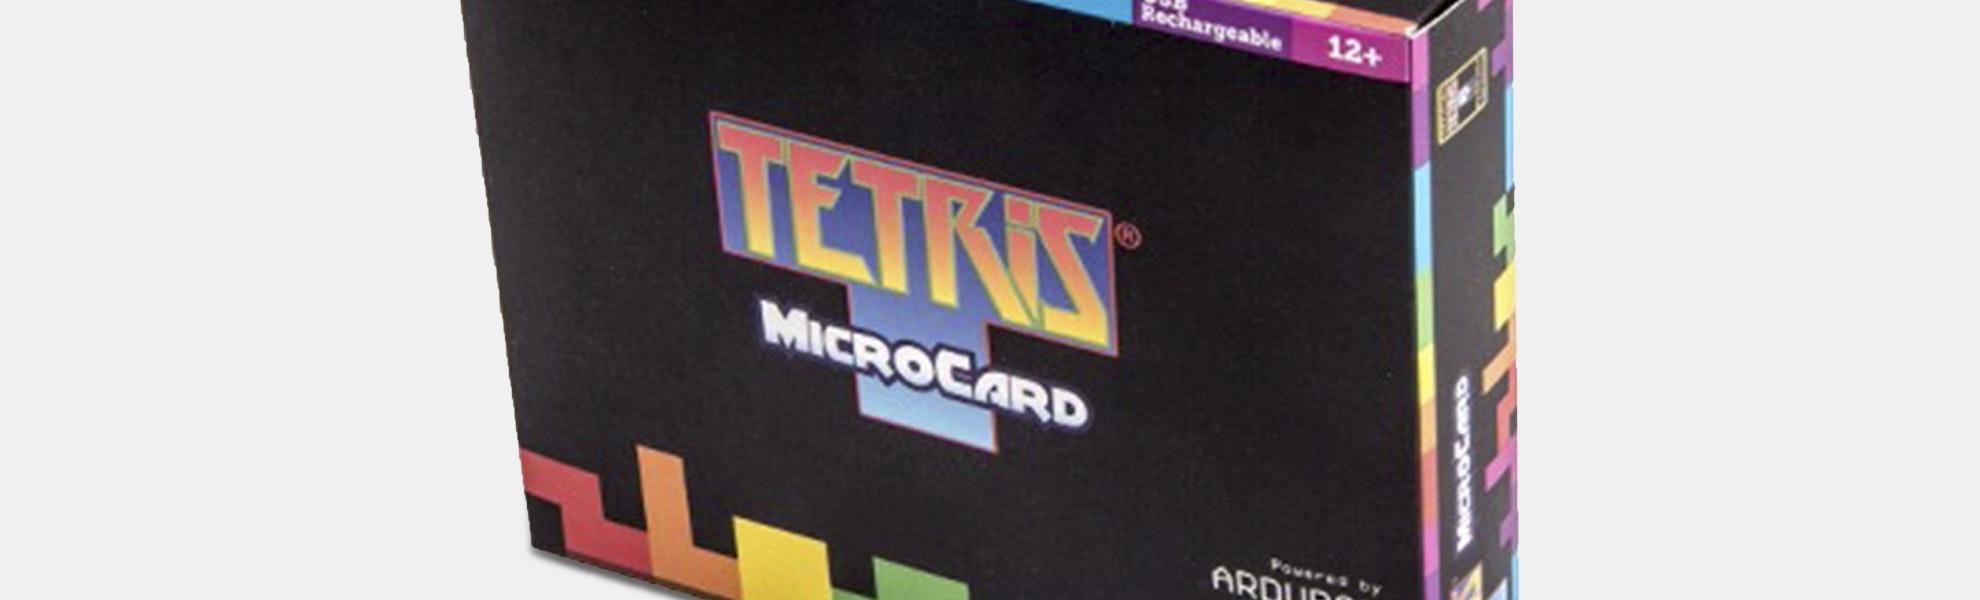 Seeed Tetris Arduboy MicroCard